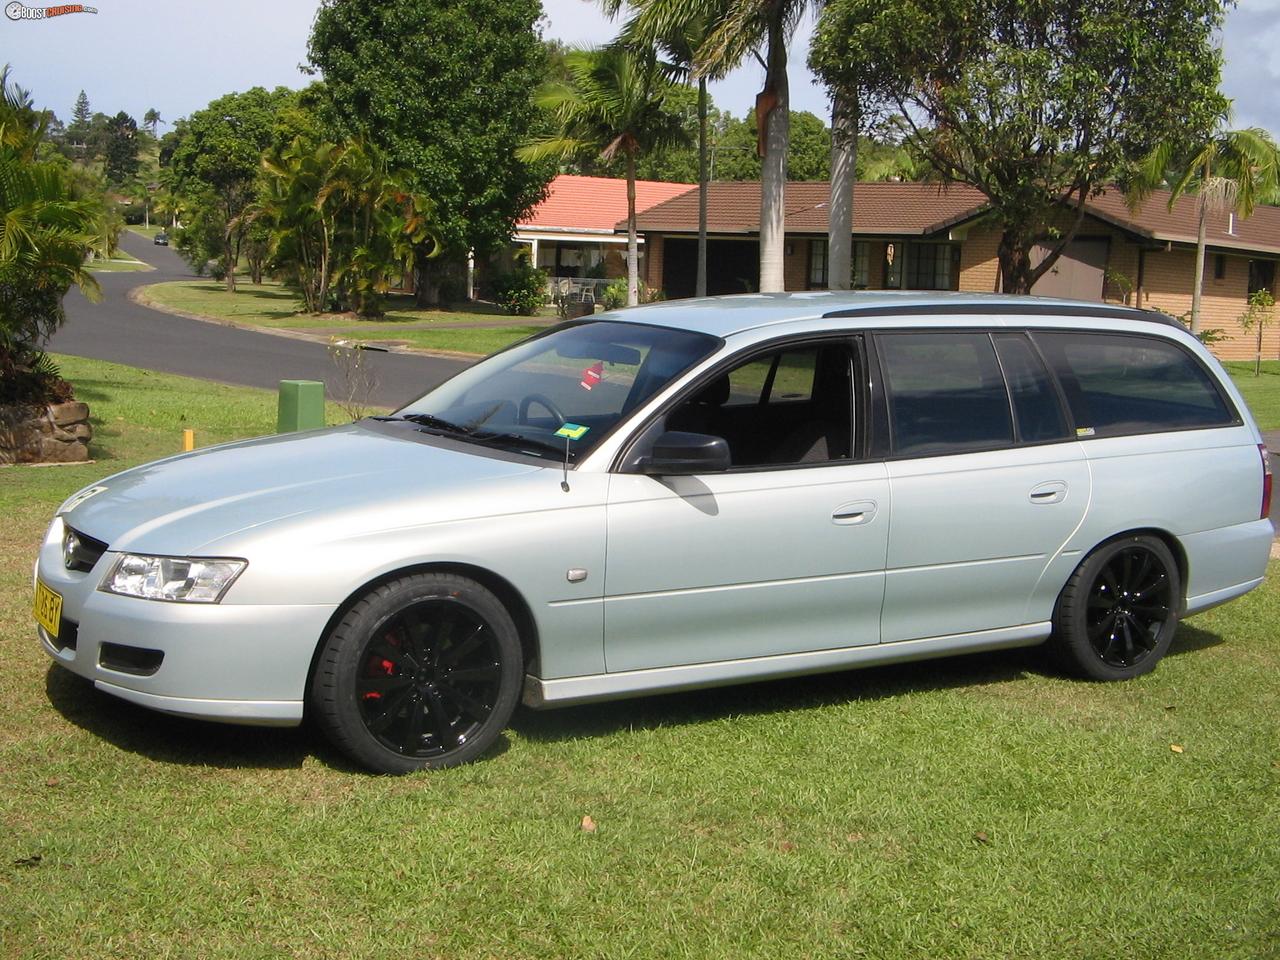 2006 Holden Commodore Vz - BoostCruising